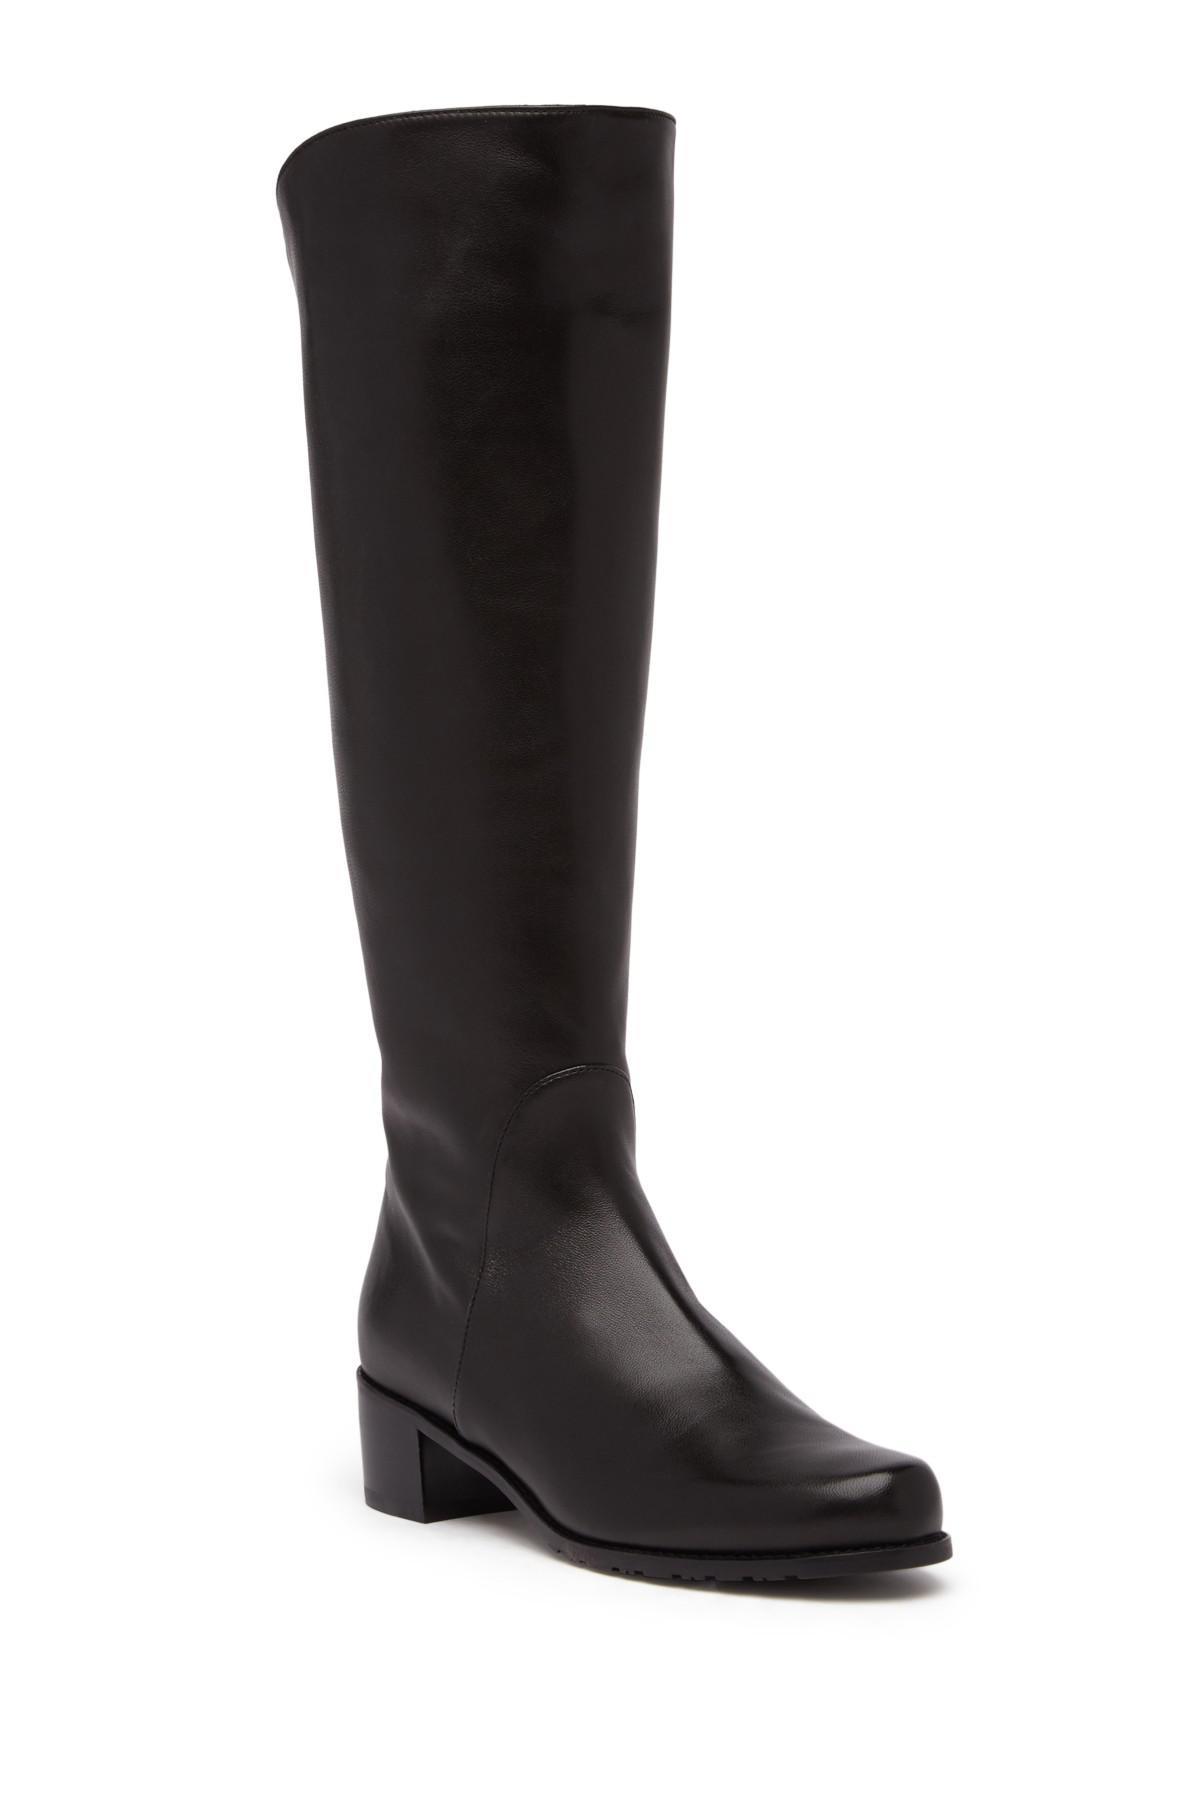 581209398fd Lyst - Stuart Weitzman Arlington Boot in Black